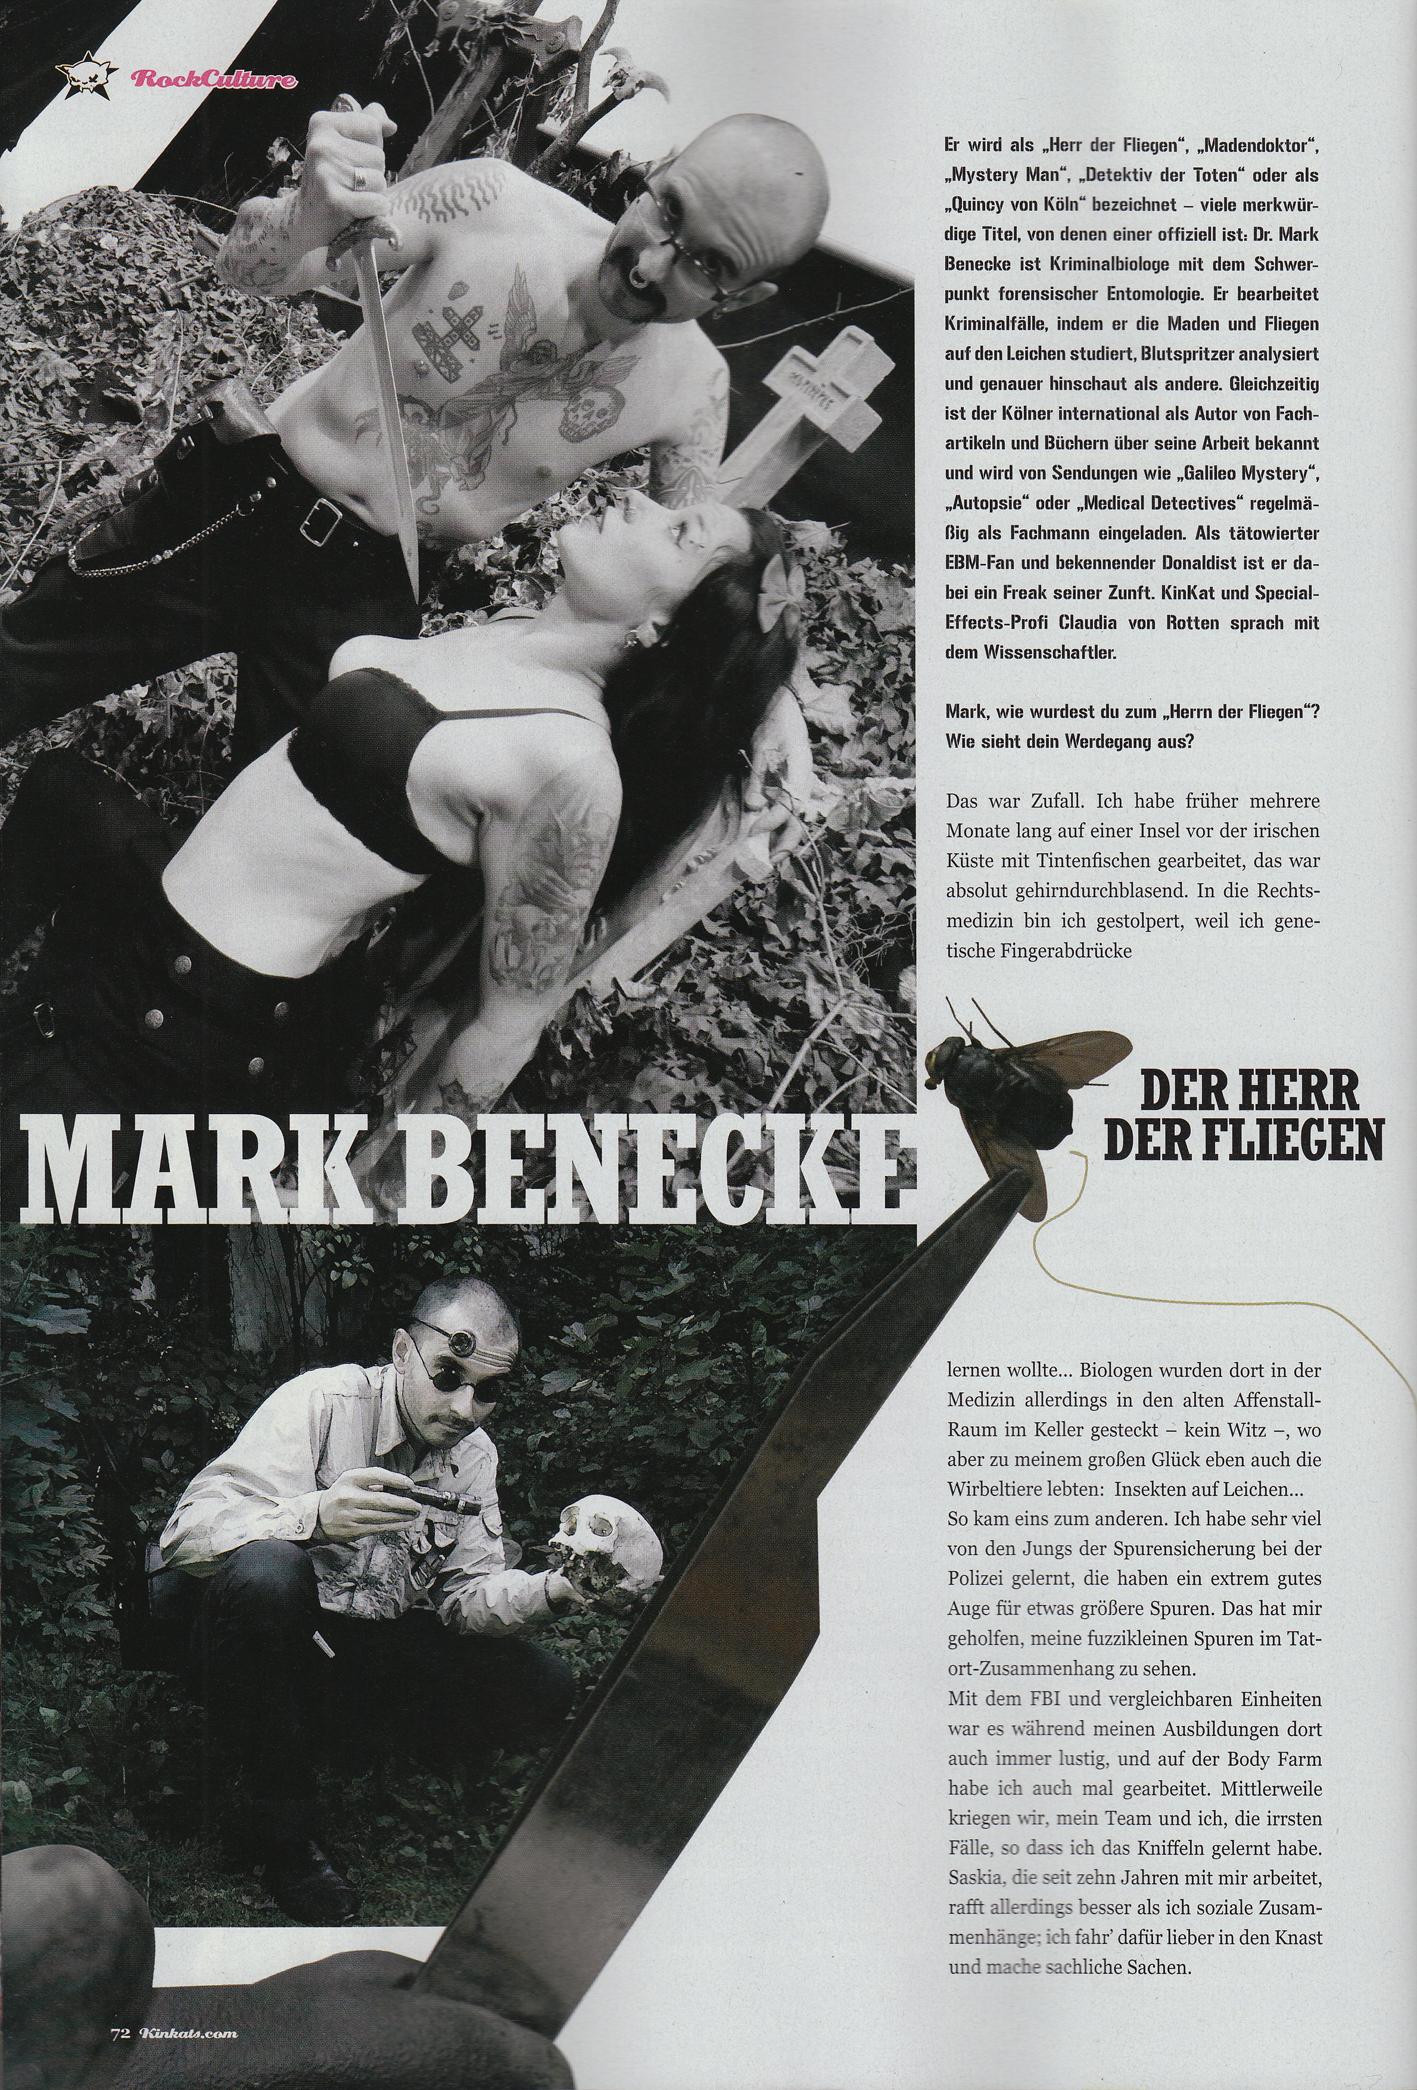 2010 Februar Maerz Kinkats Mark Benecke Mark Benecke Forensic Wiki